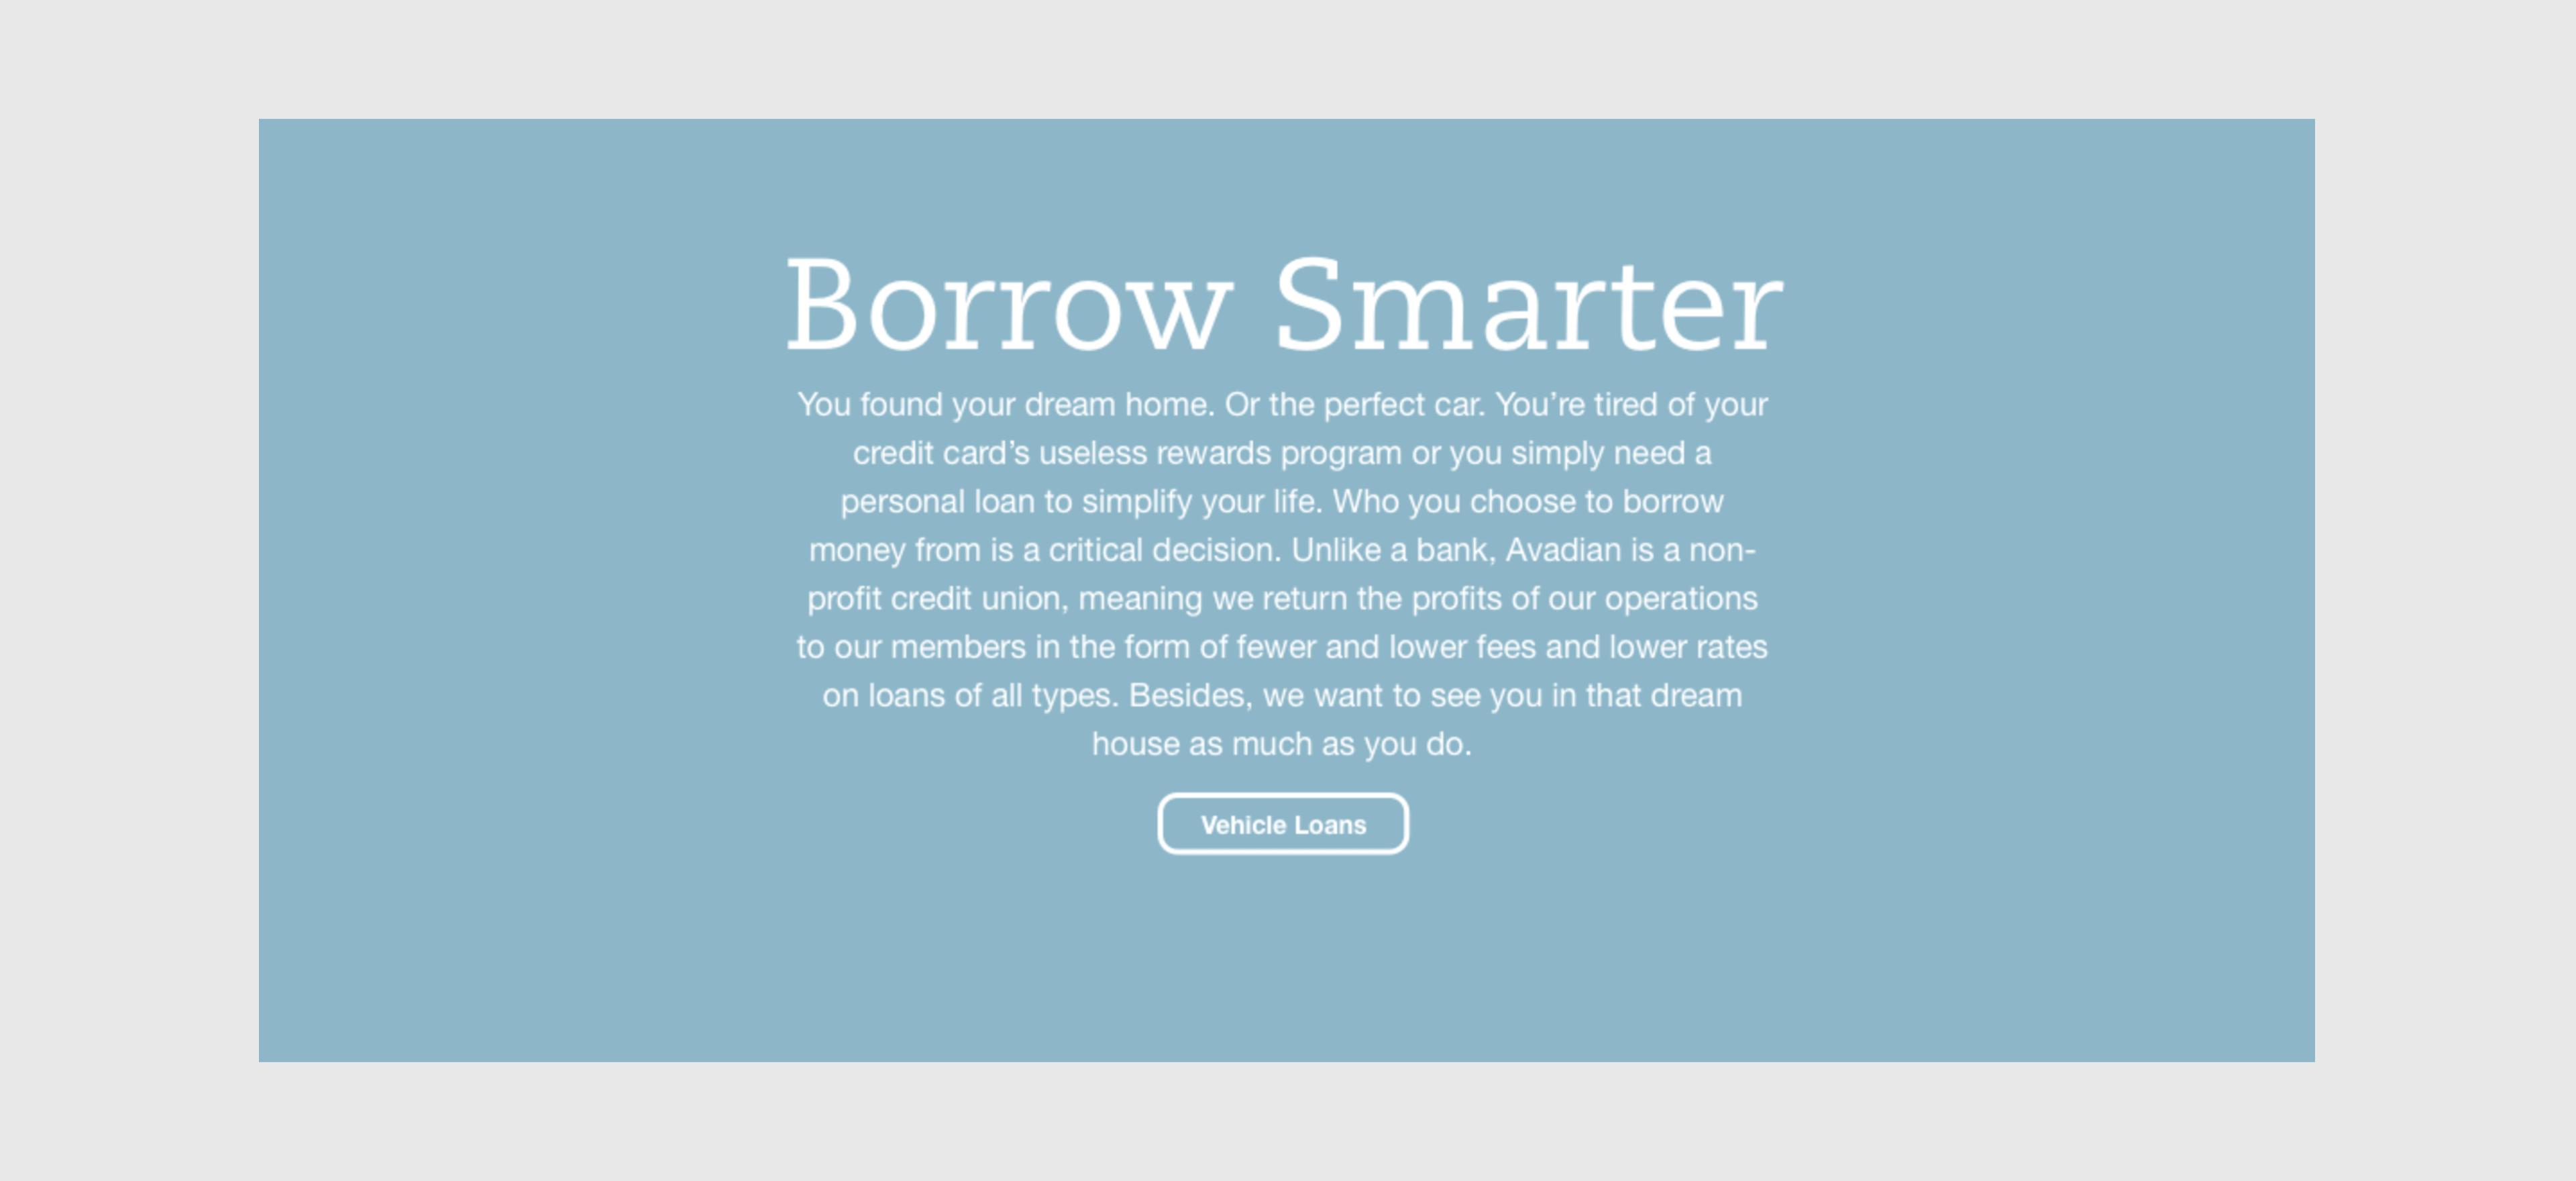 Borrow Smarter